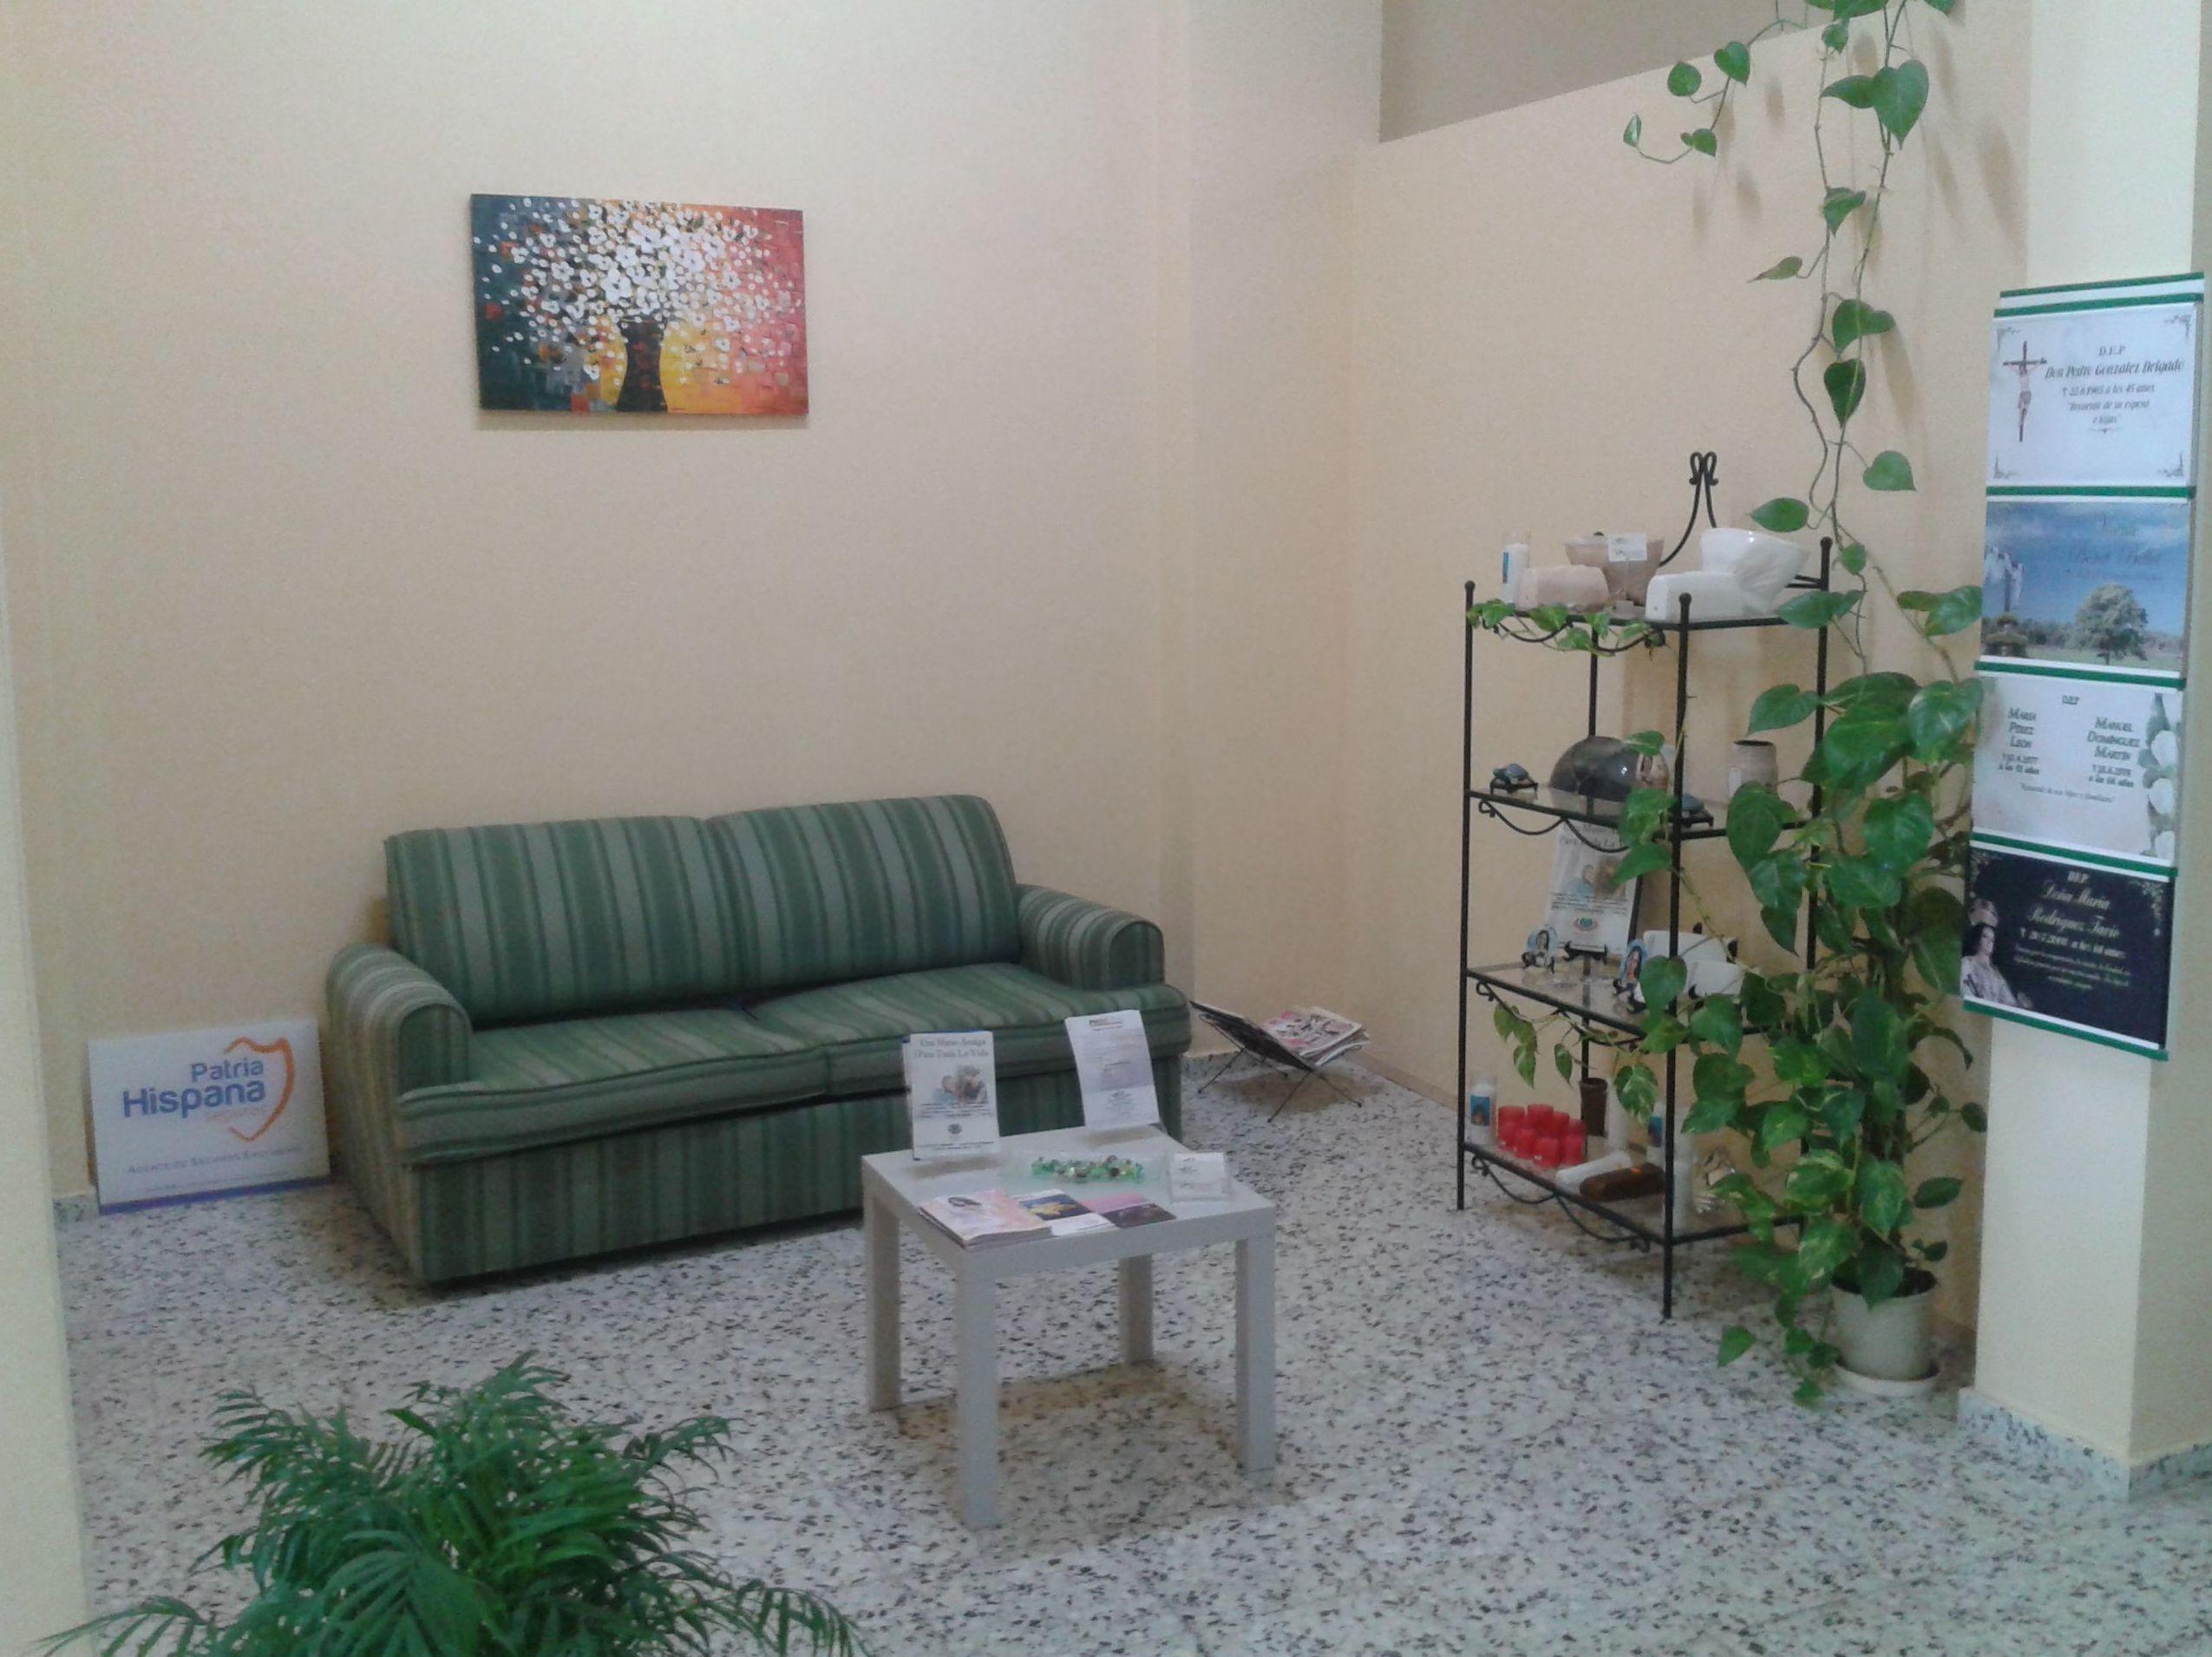 Publicación de Esquelas: Servicios de Funeraria Ramos